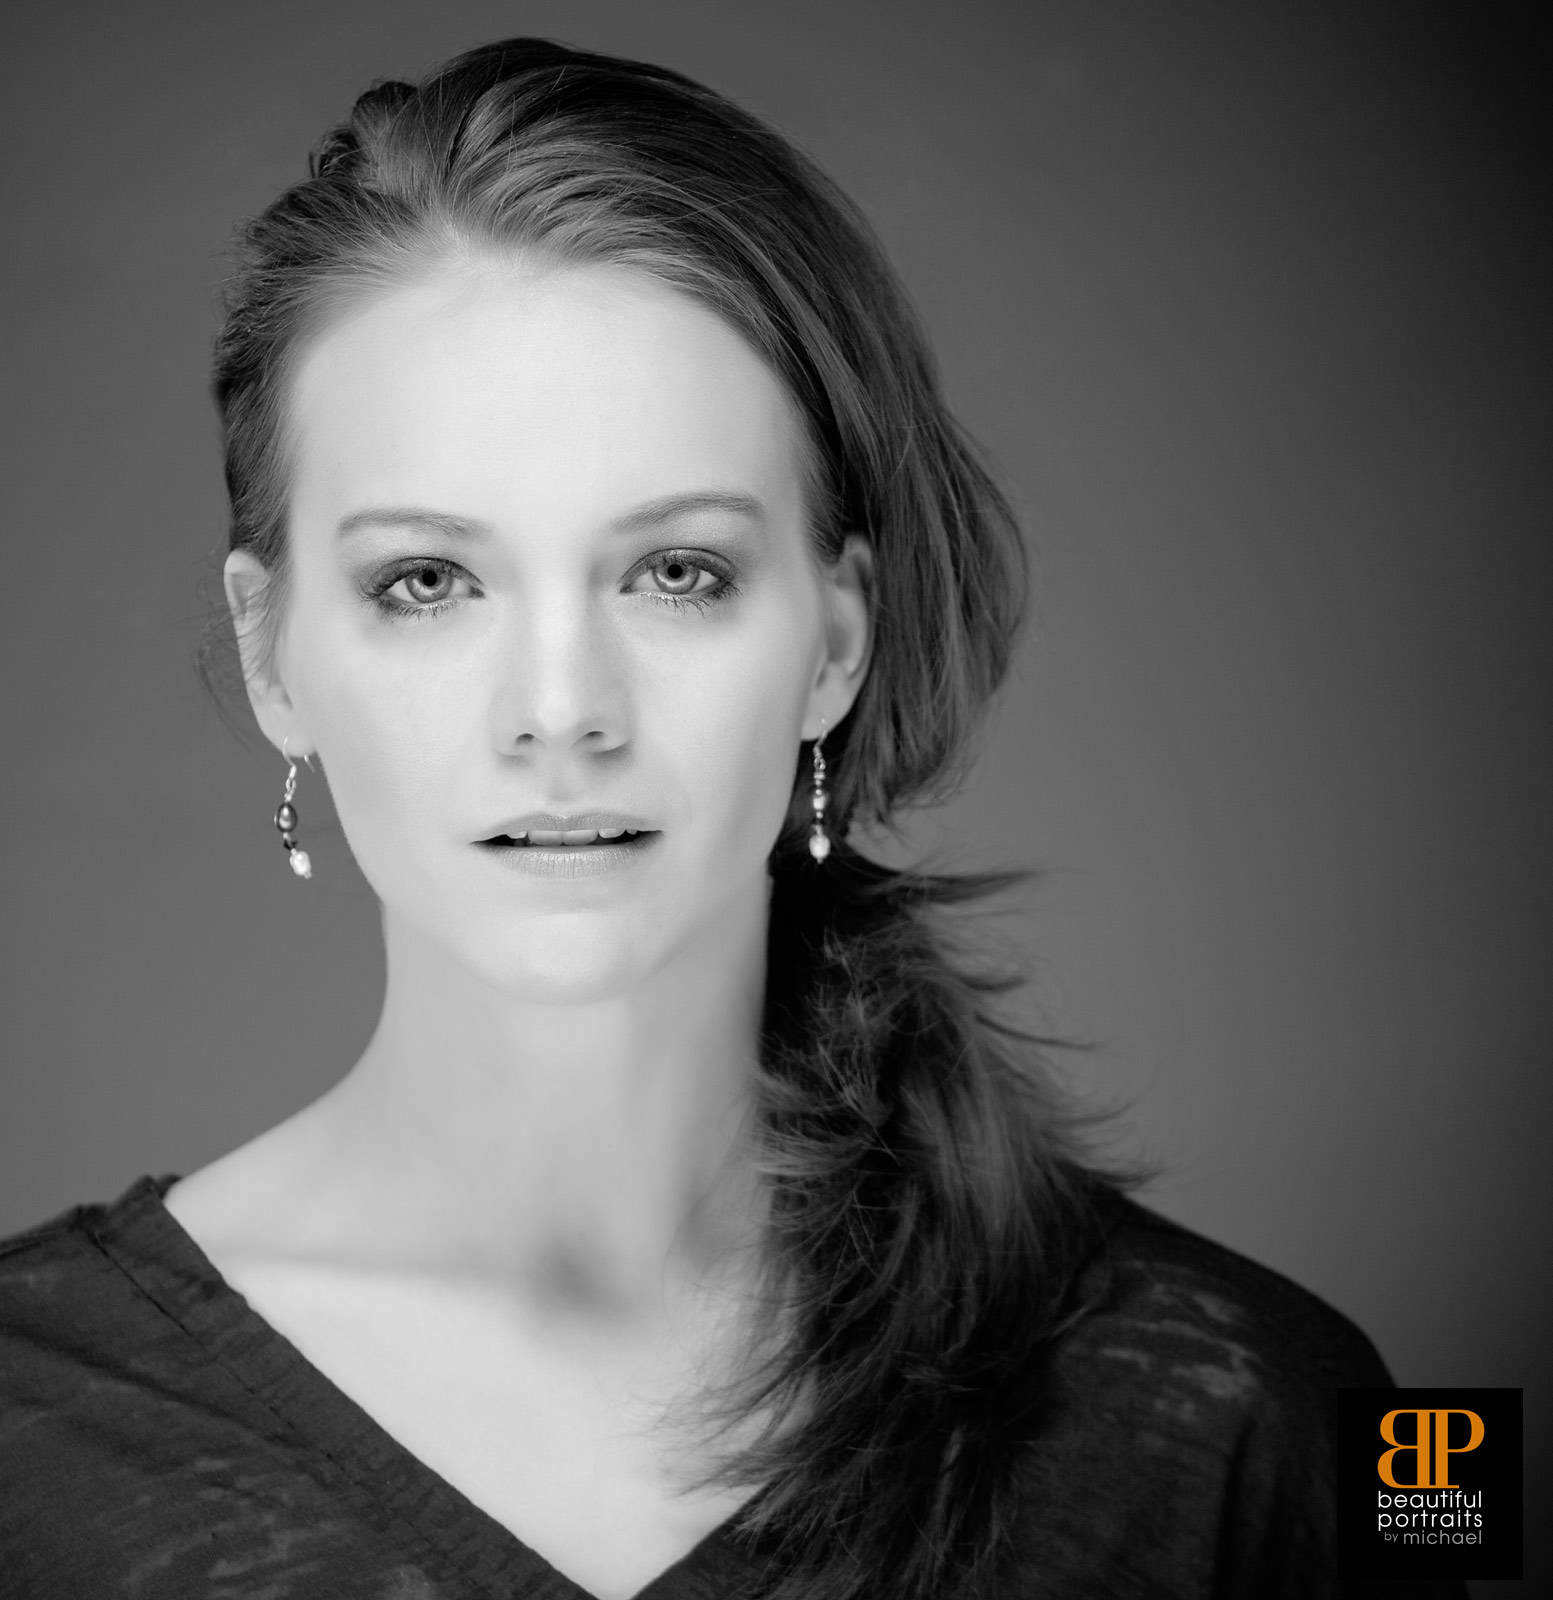 Actress: Kj Lyn